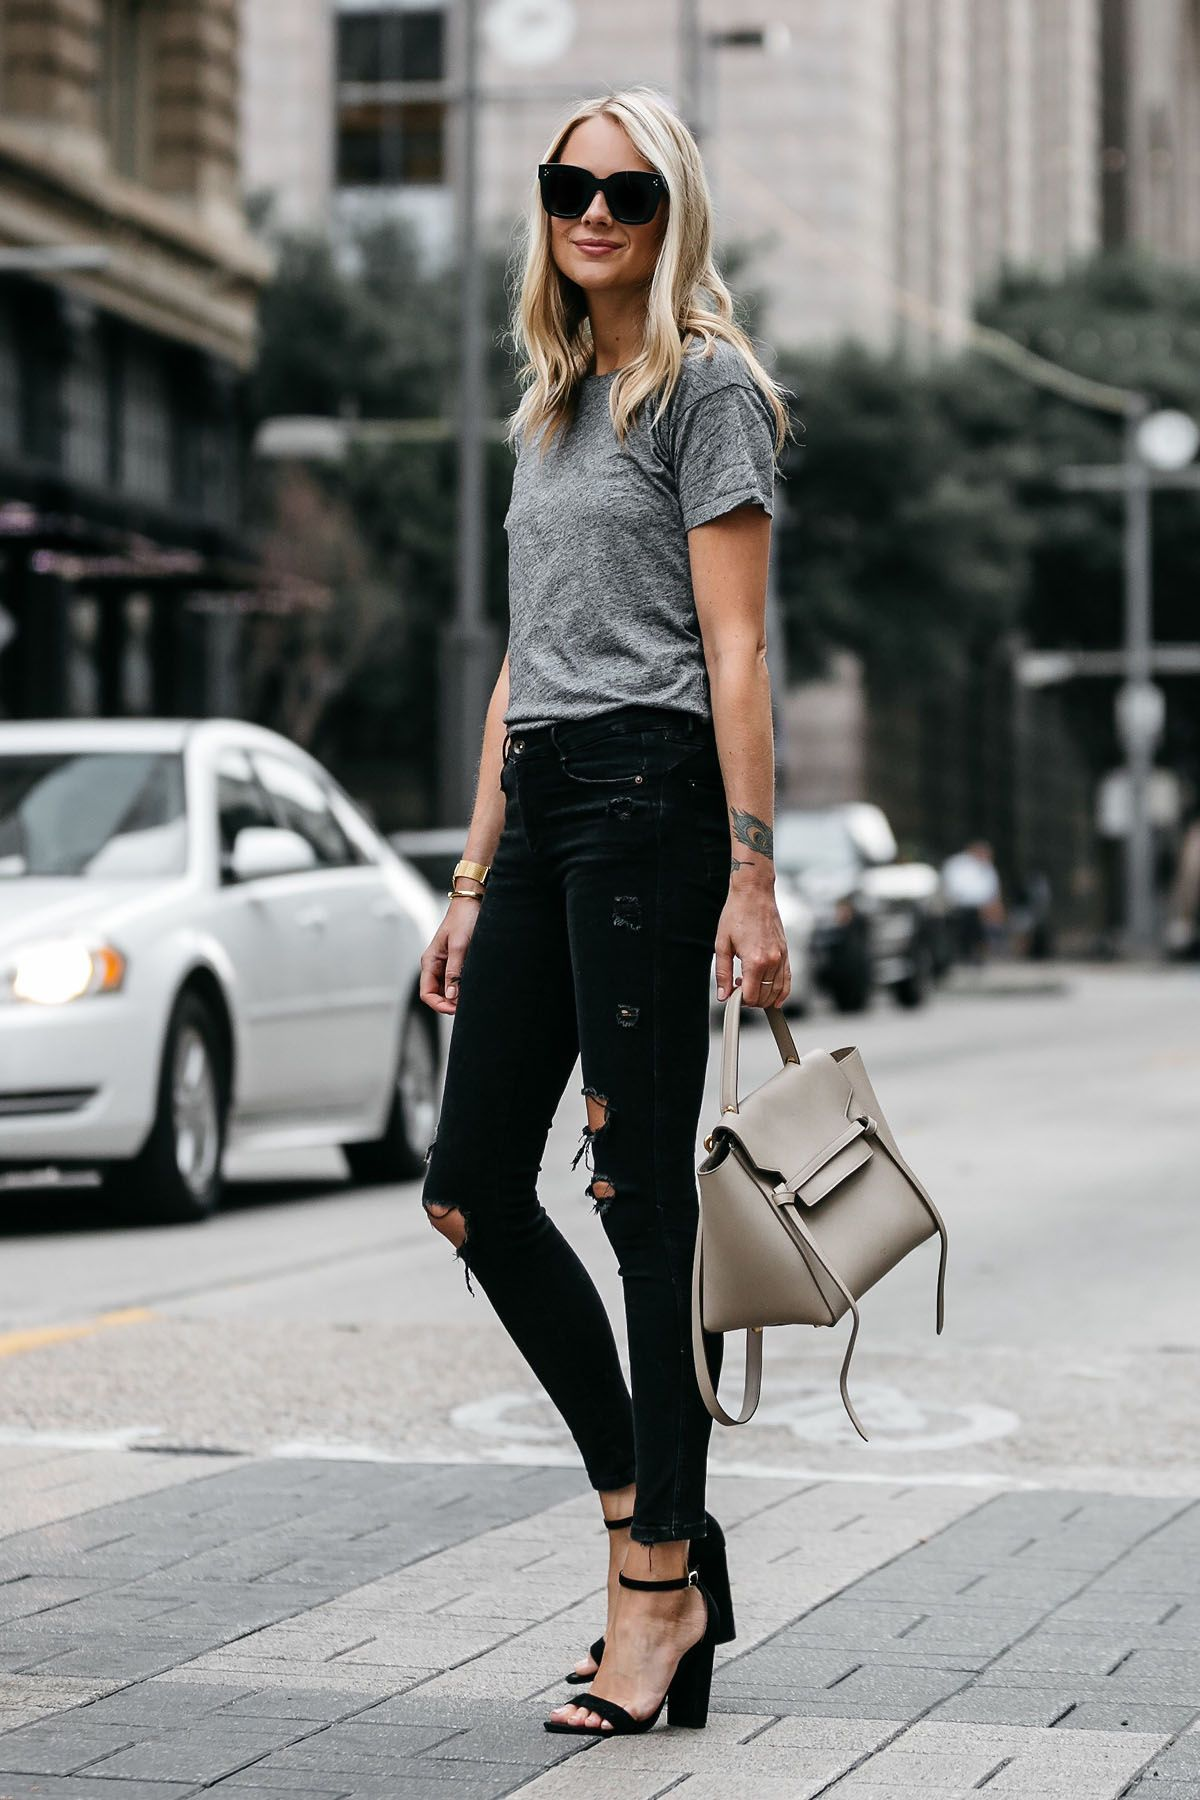 e3b18650849 Blonde woman wearing Madewell grey tshirt zara black ripped skinny jeans  outfit steve madden black ankle strap heels celine belt bag street style  dallas ...